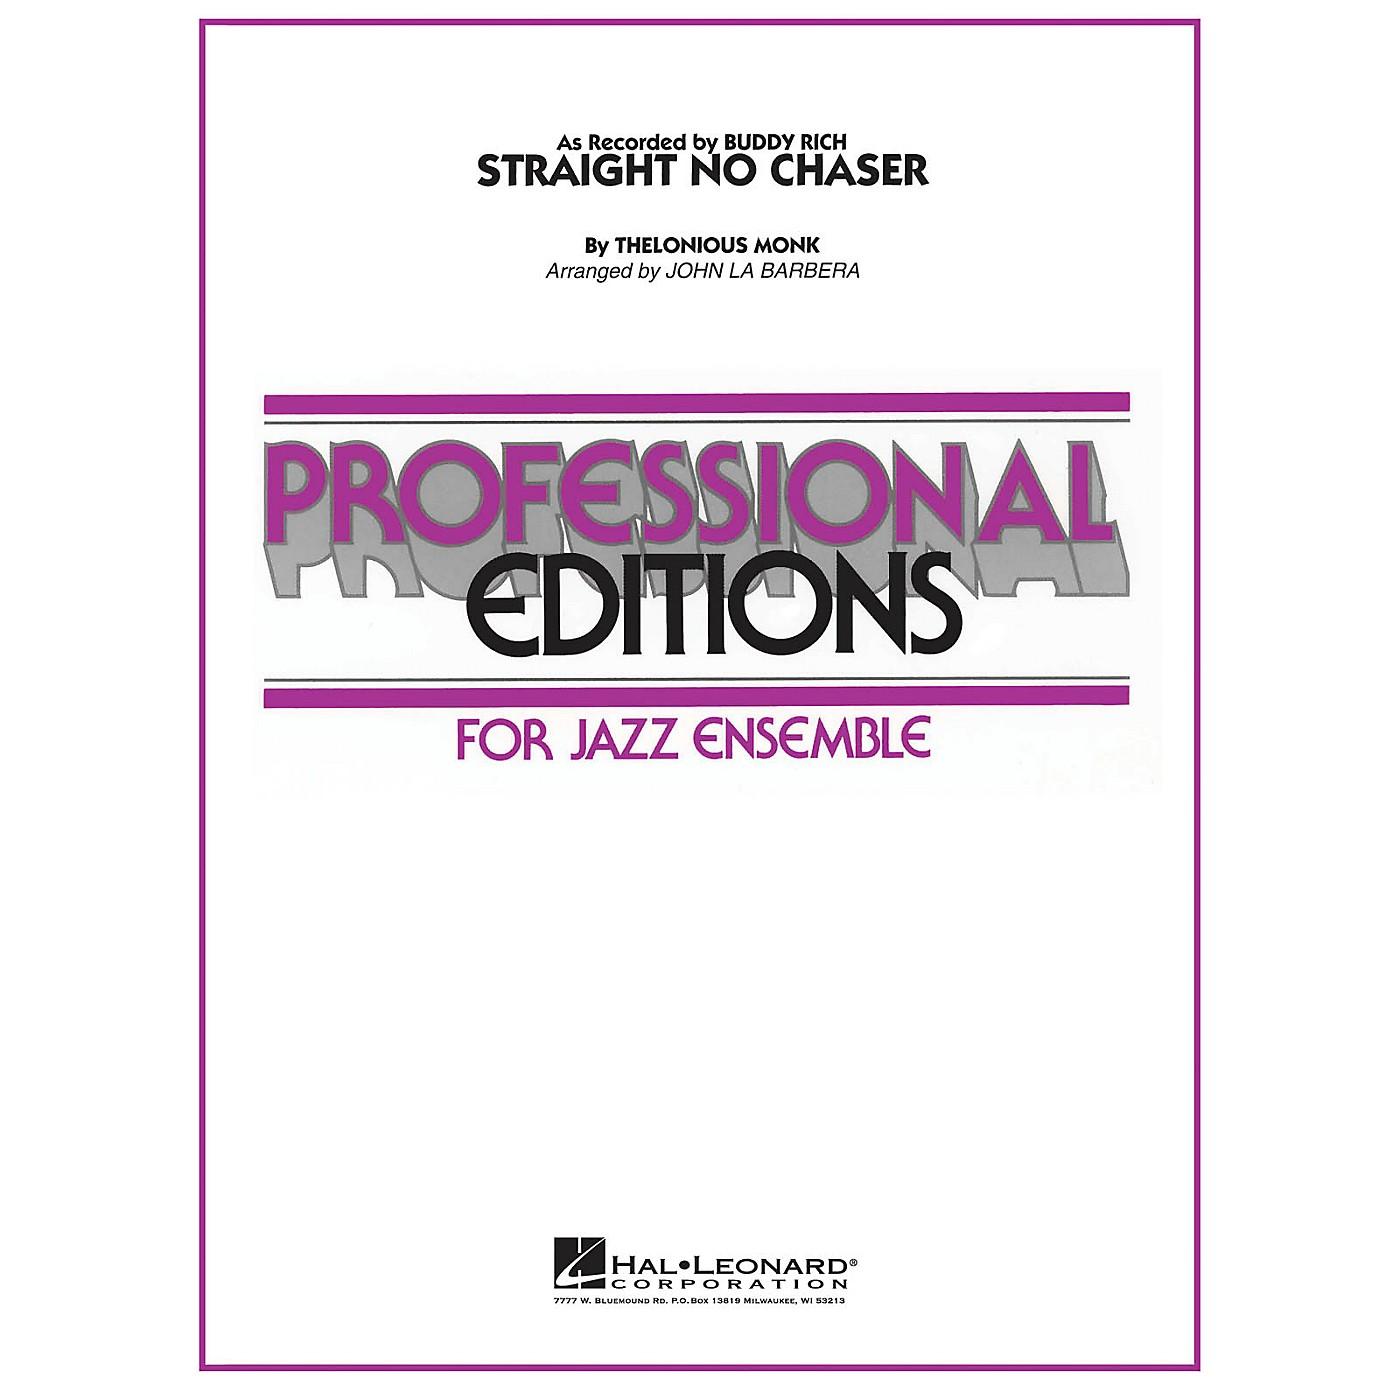 Hal Leonard Straight No Chaser Jazz Band Level 5-6 Arranged by John La Barbera thumbnail